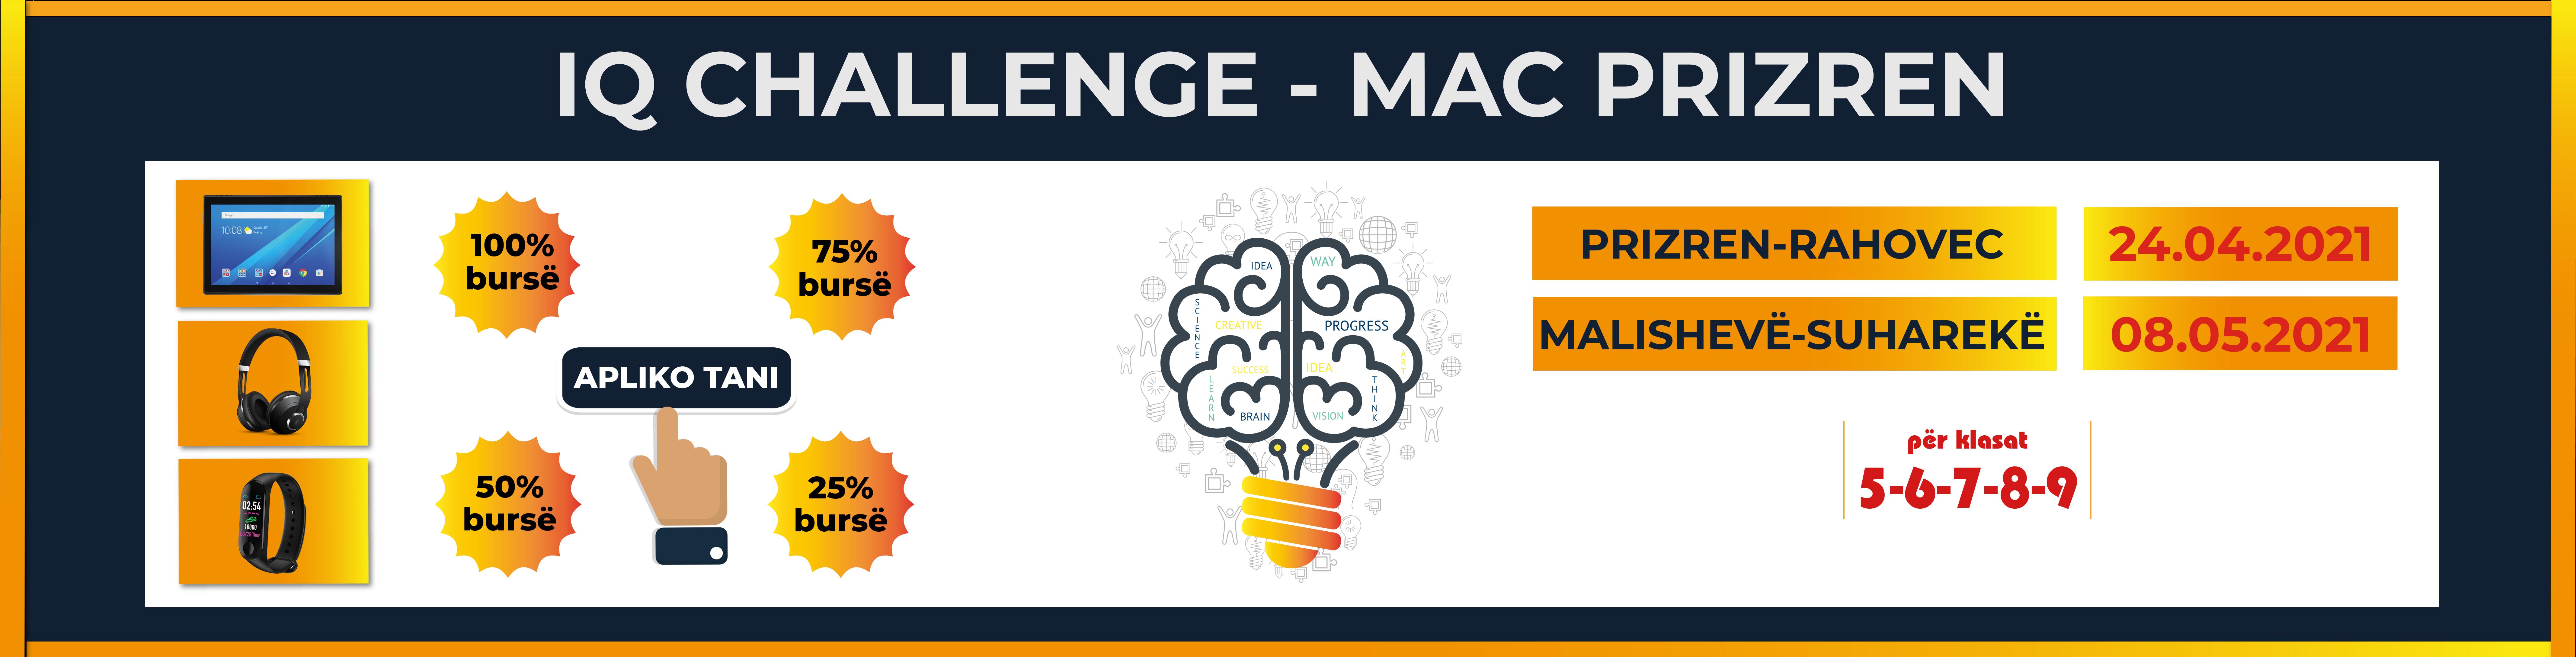 Apply for IQ CHALLENGE - MAC PRIZREN